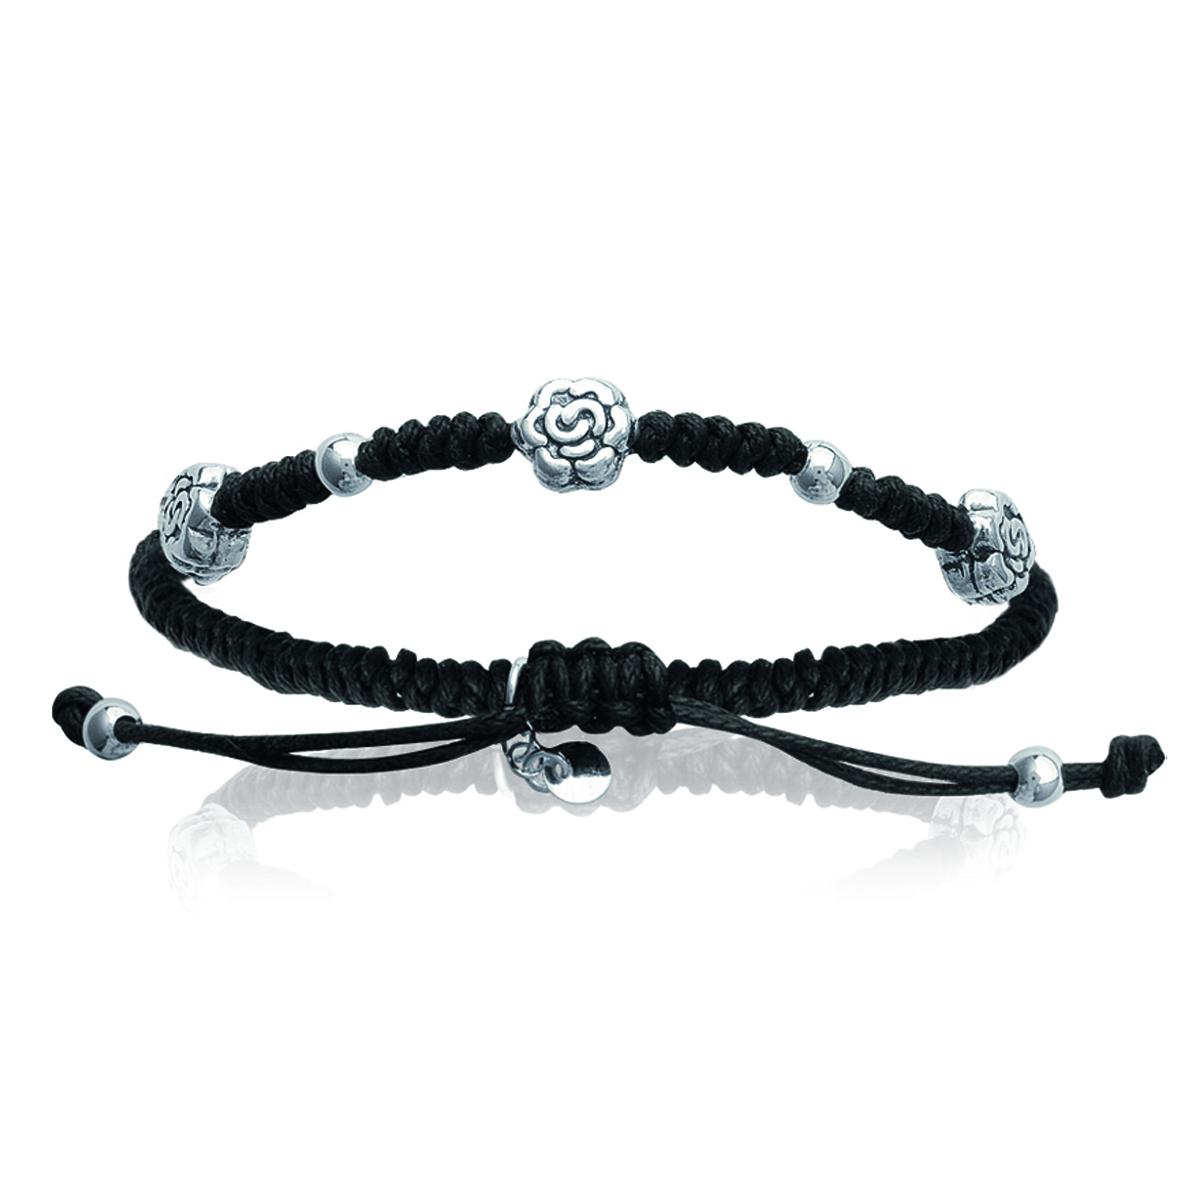 Bracelet Argent shambhala \'Flora\' noir - 7 mm - [I9118]